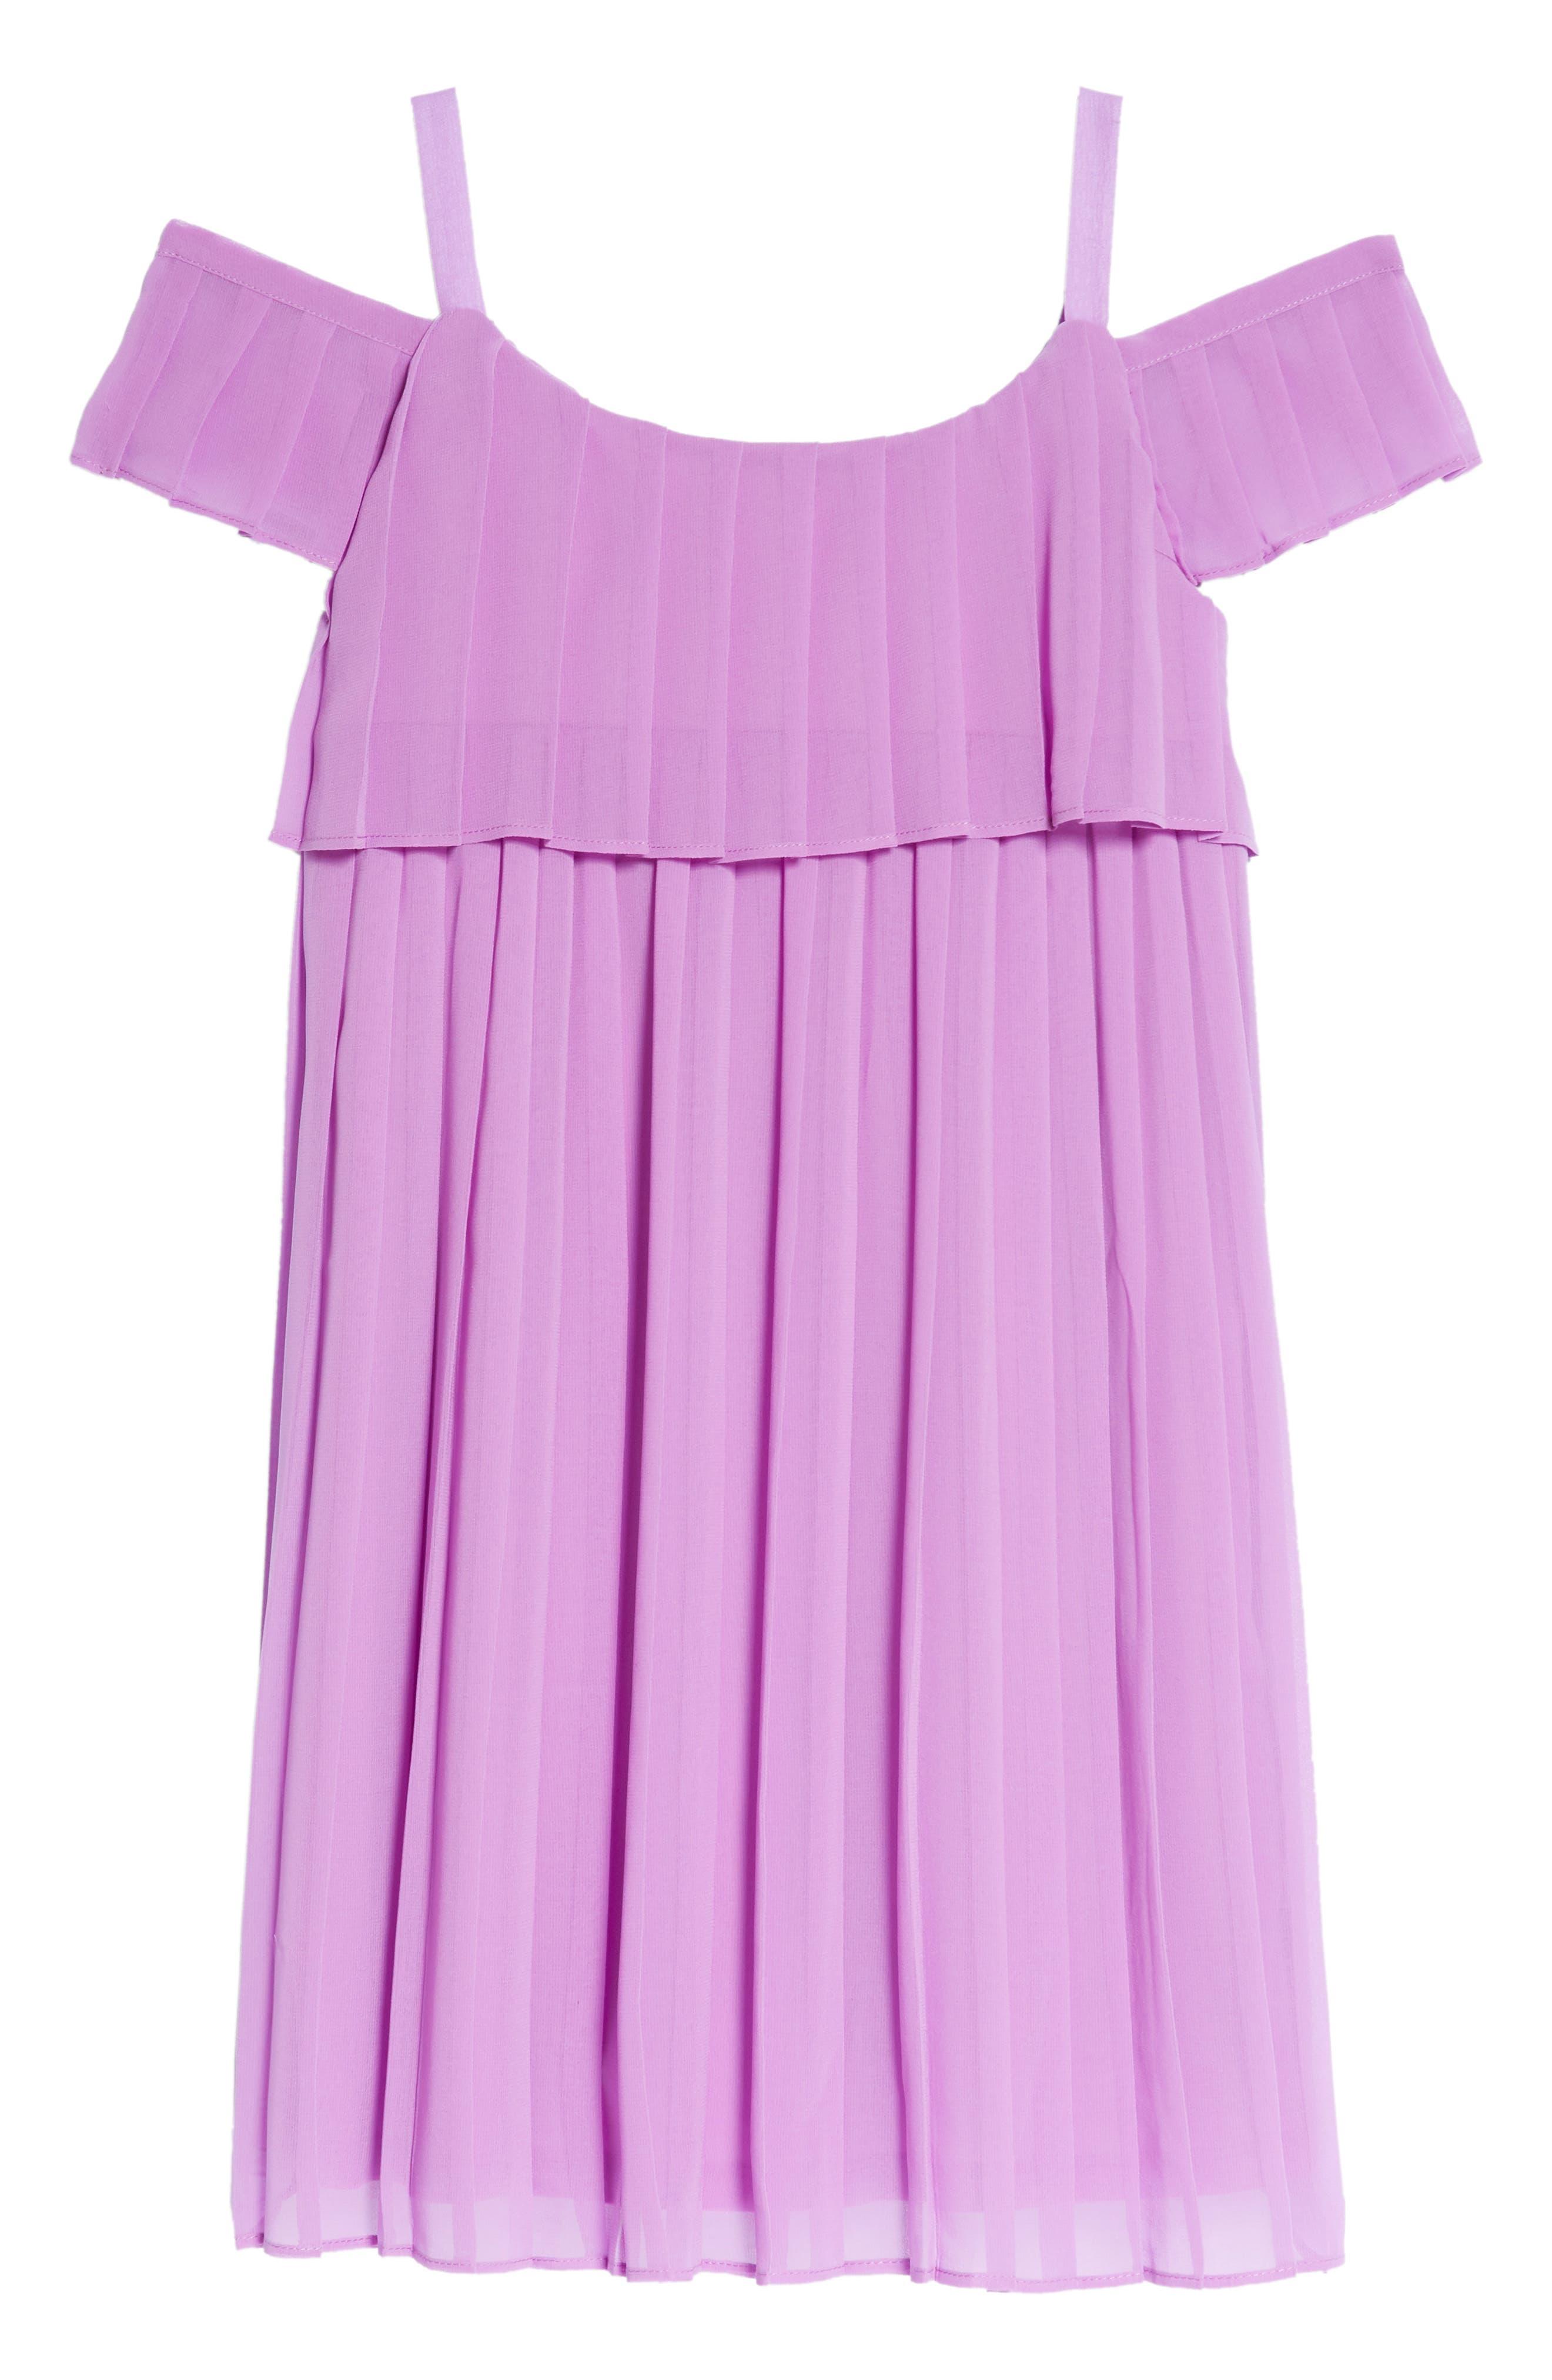 Chiffon Cold Shoulder Dress,                             Alternate thumbnail 2, color,                             530